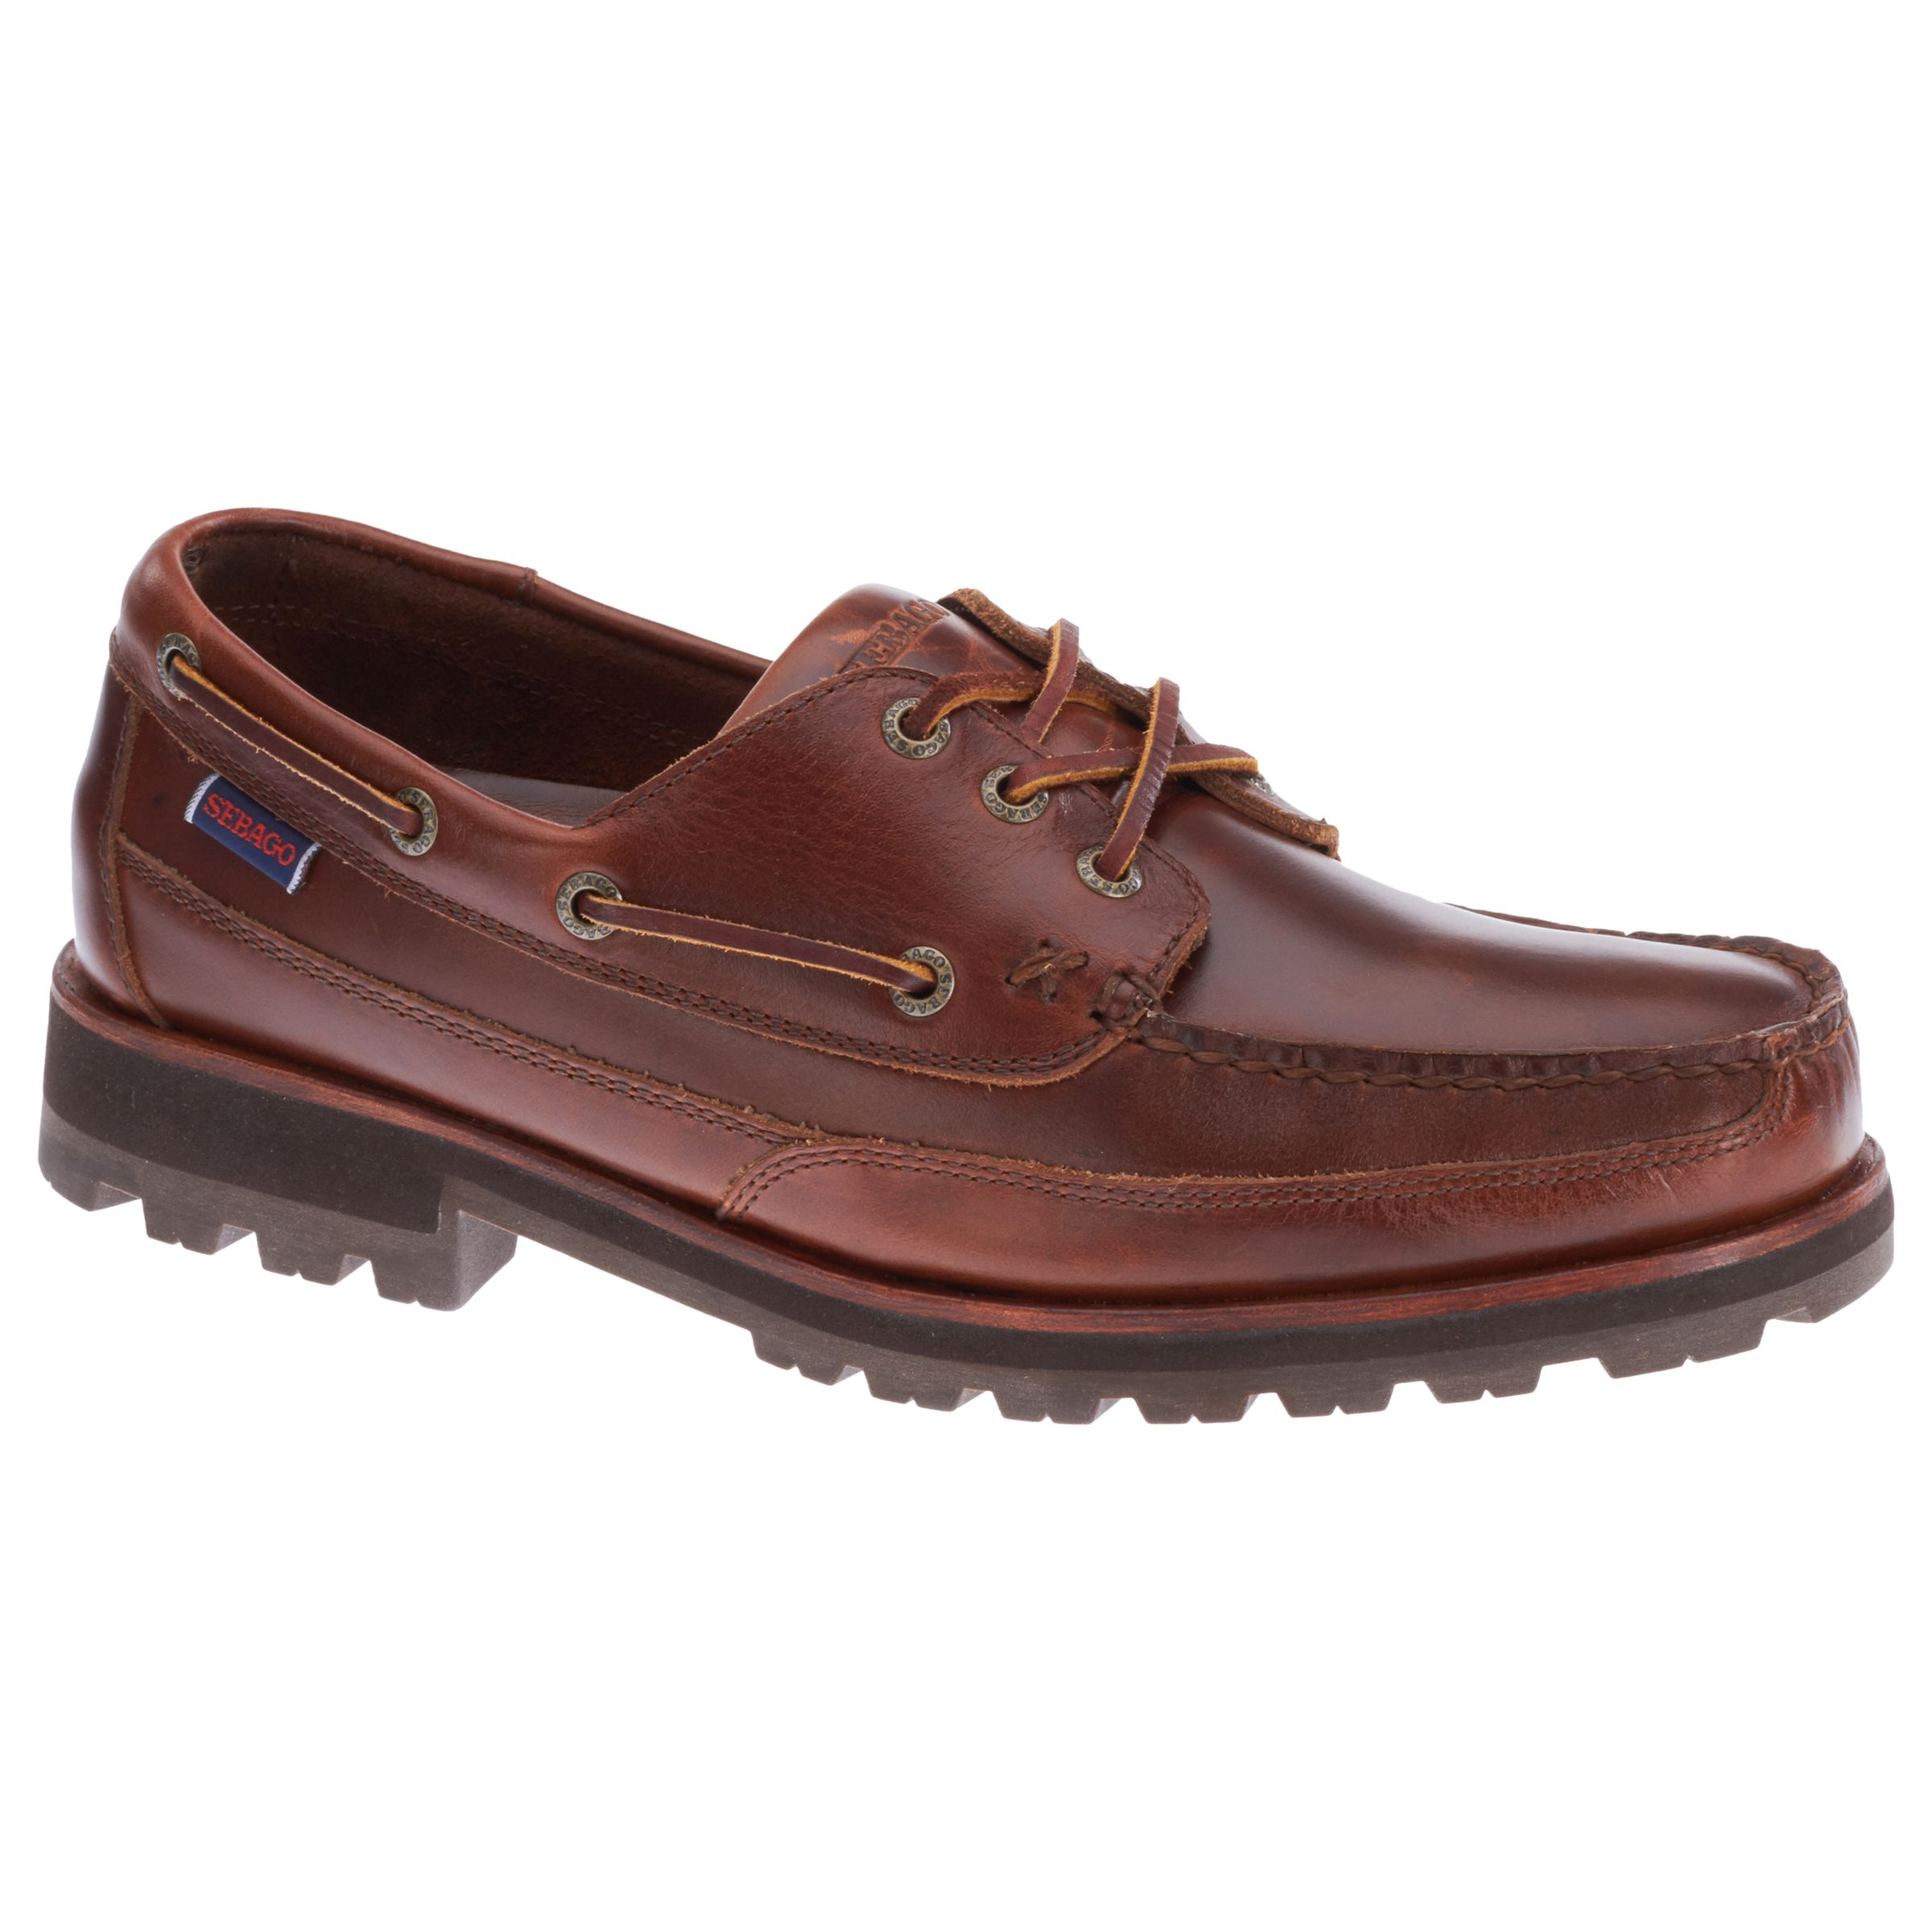 Sebago Sebago Vershire 3 Eyelet Shoes, Brown